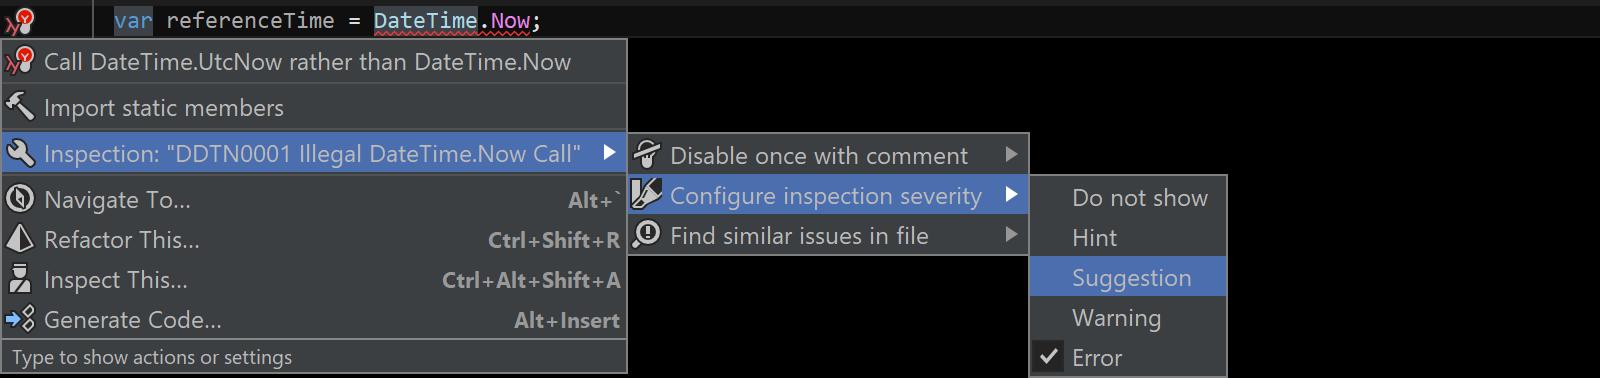 Configure severity using Alt+Enter